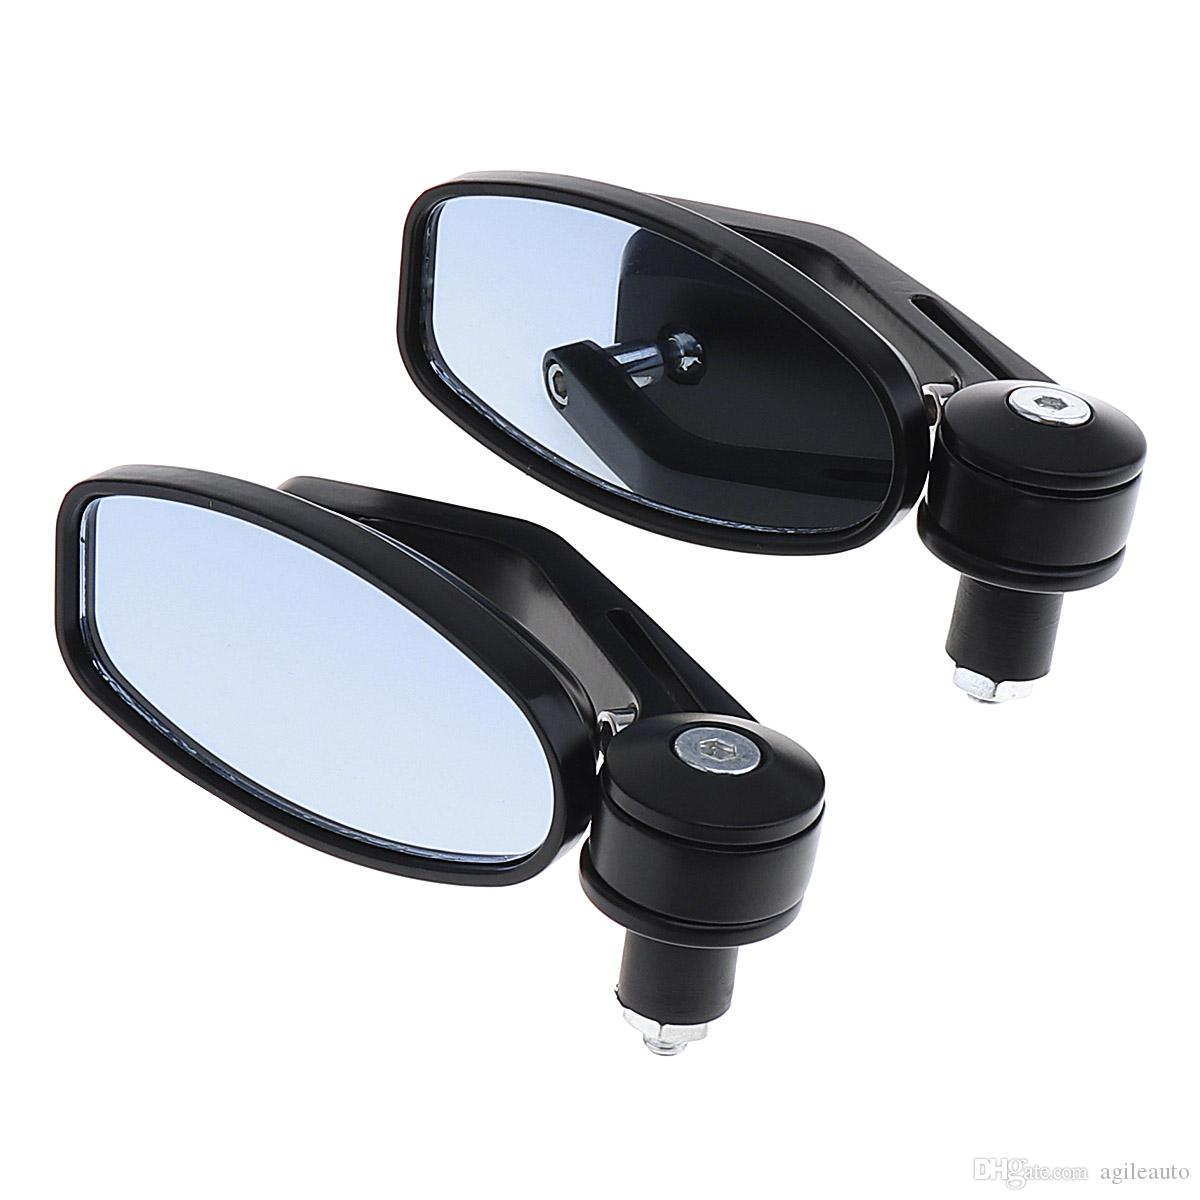 22MM تعديل جميع الألومنيوم الكرز 219 العالمي للدراجات النارية مرآة الرؤية الخلفية المرايا الجانبية للدراجات النارية MFF_20E